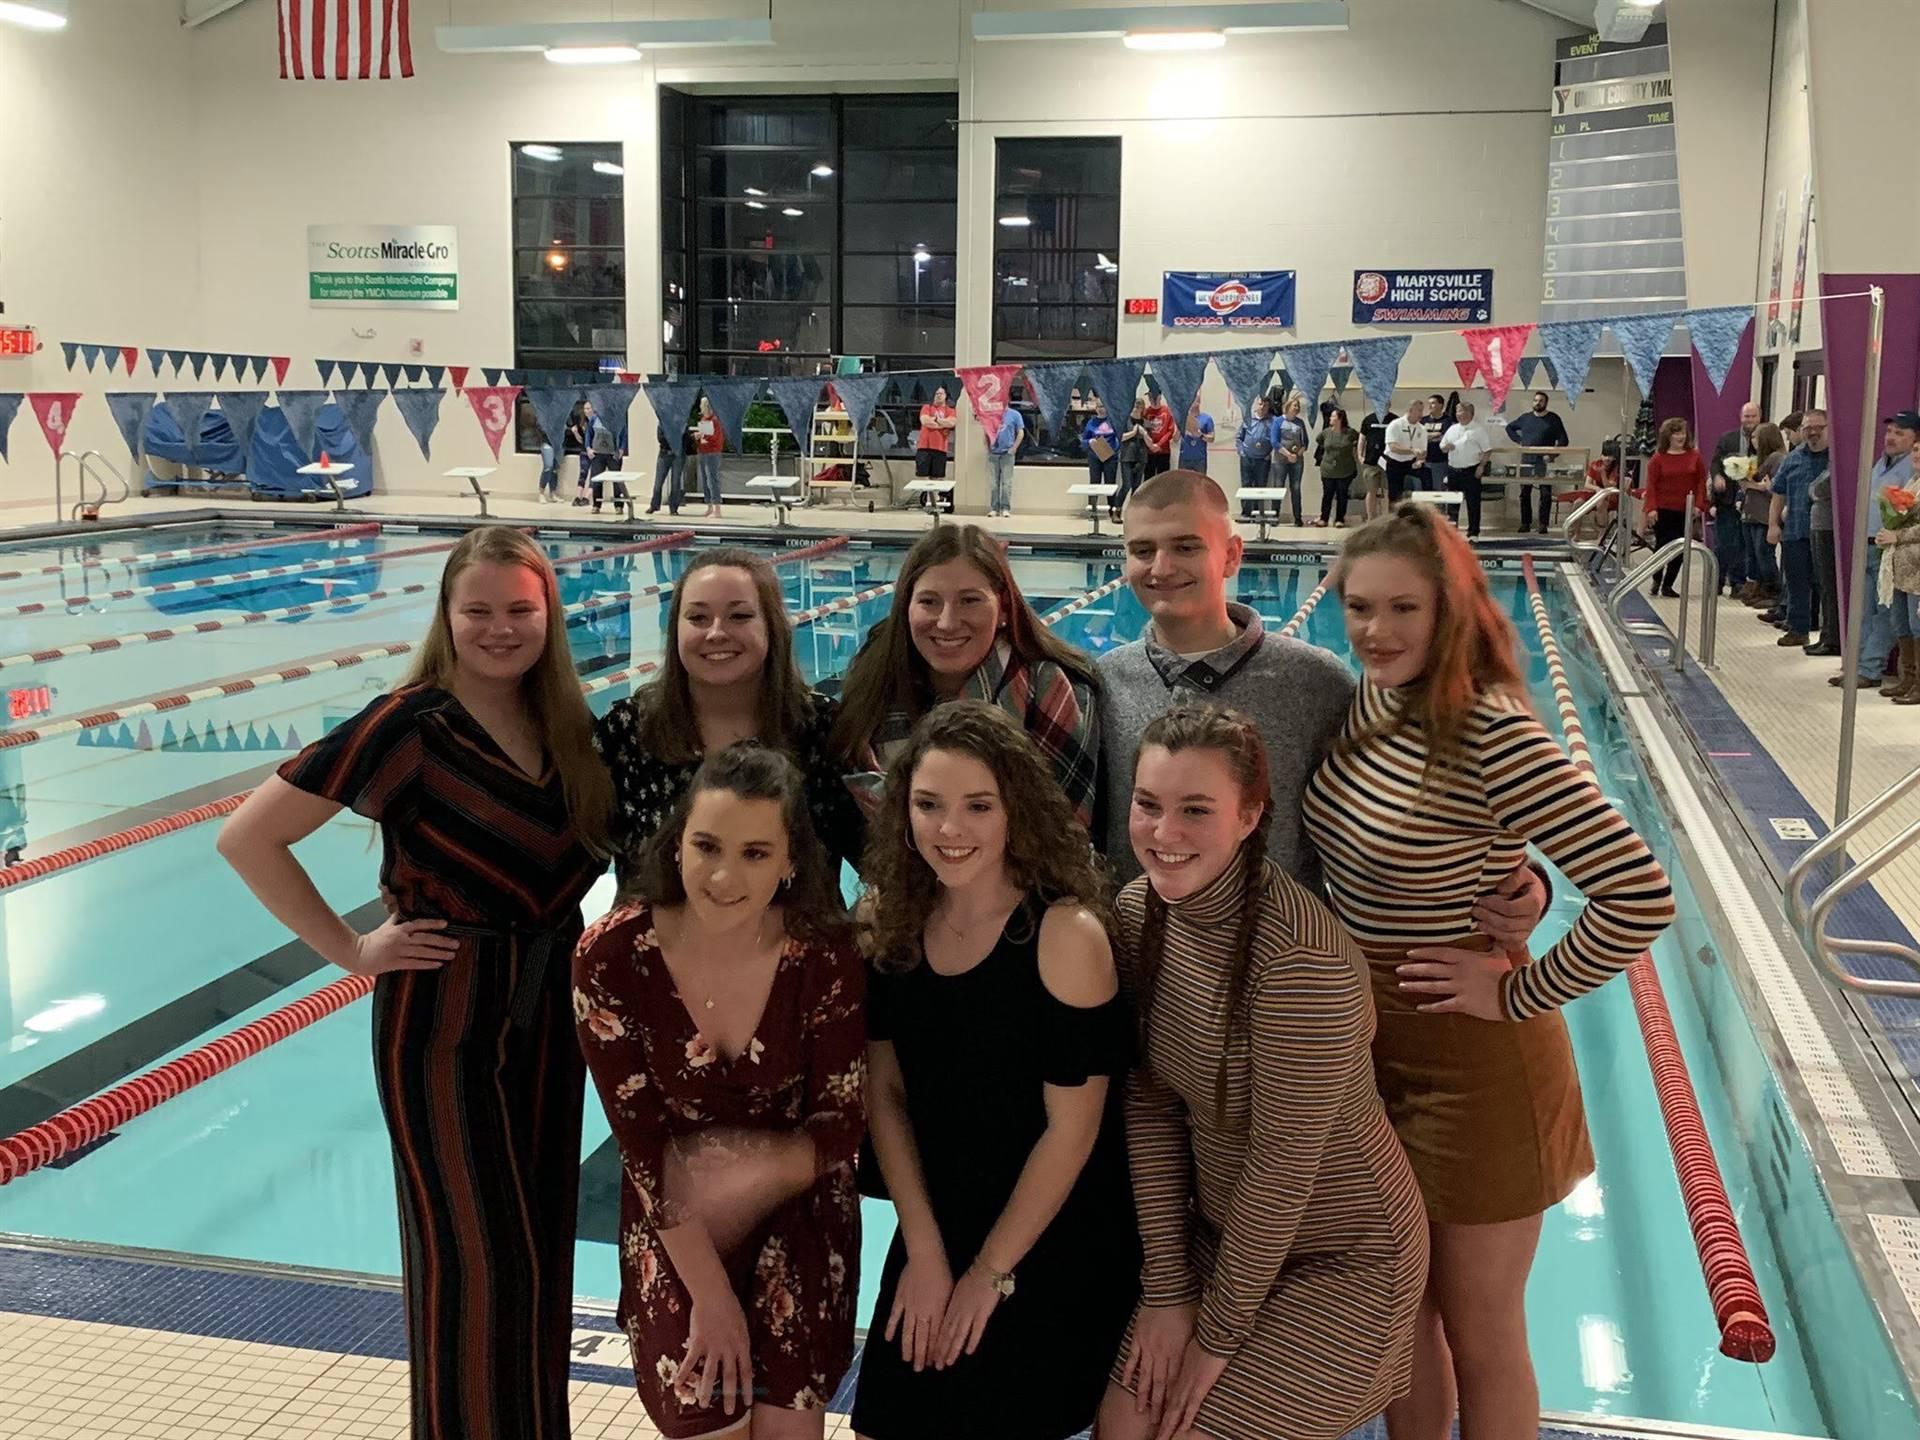 PTBM Swimmers